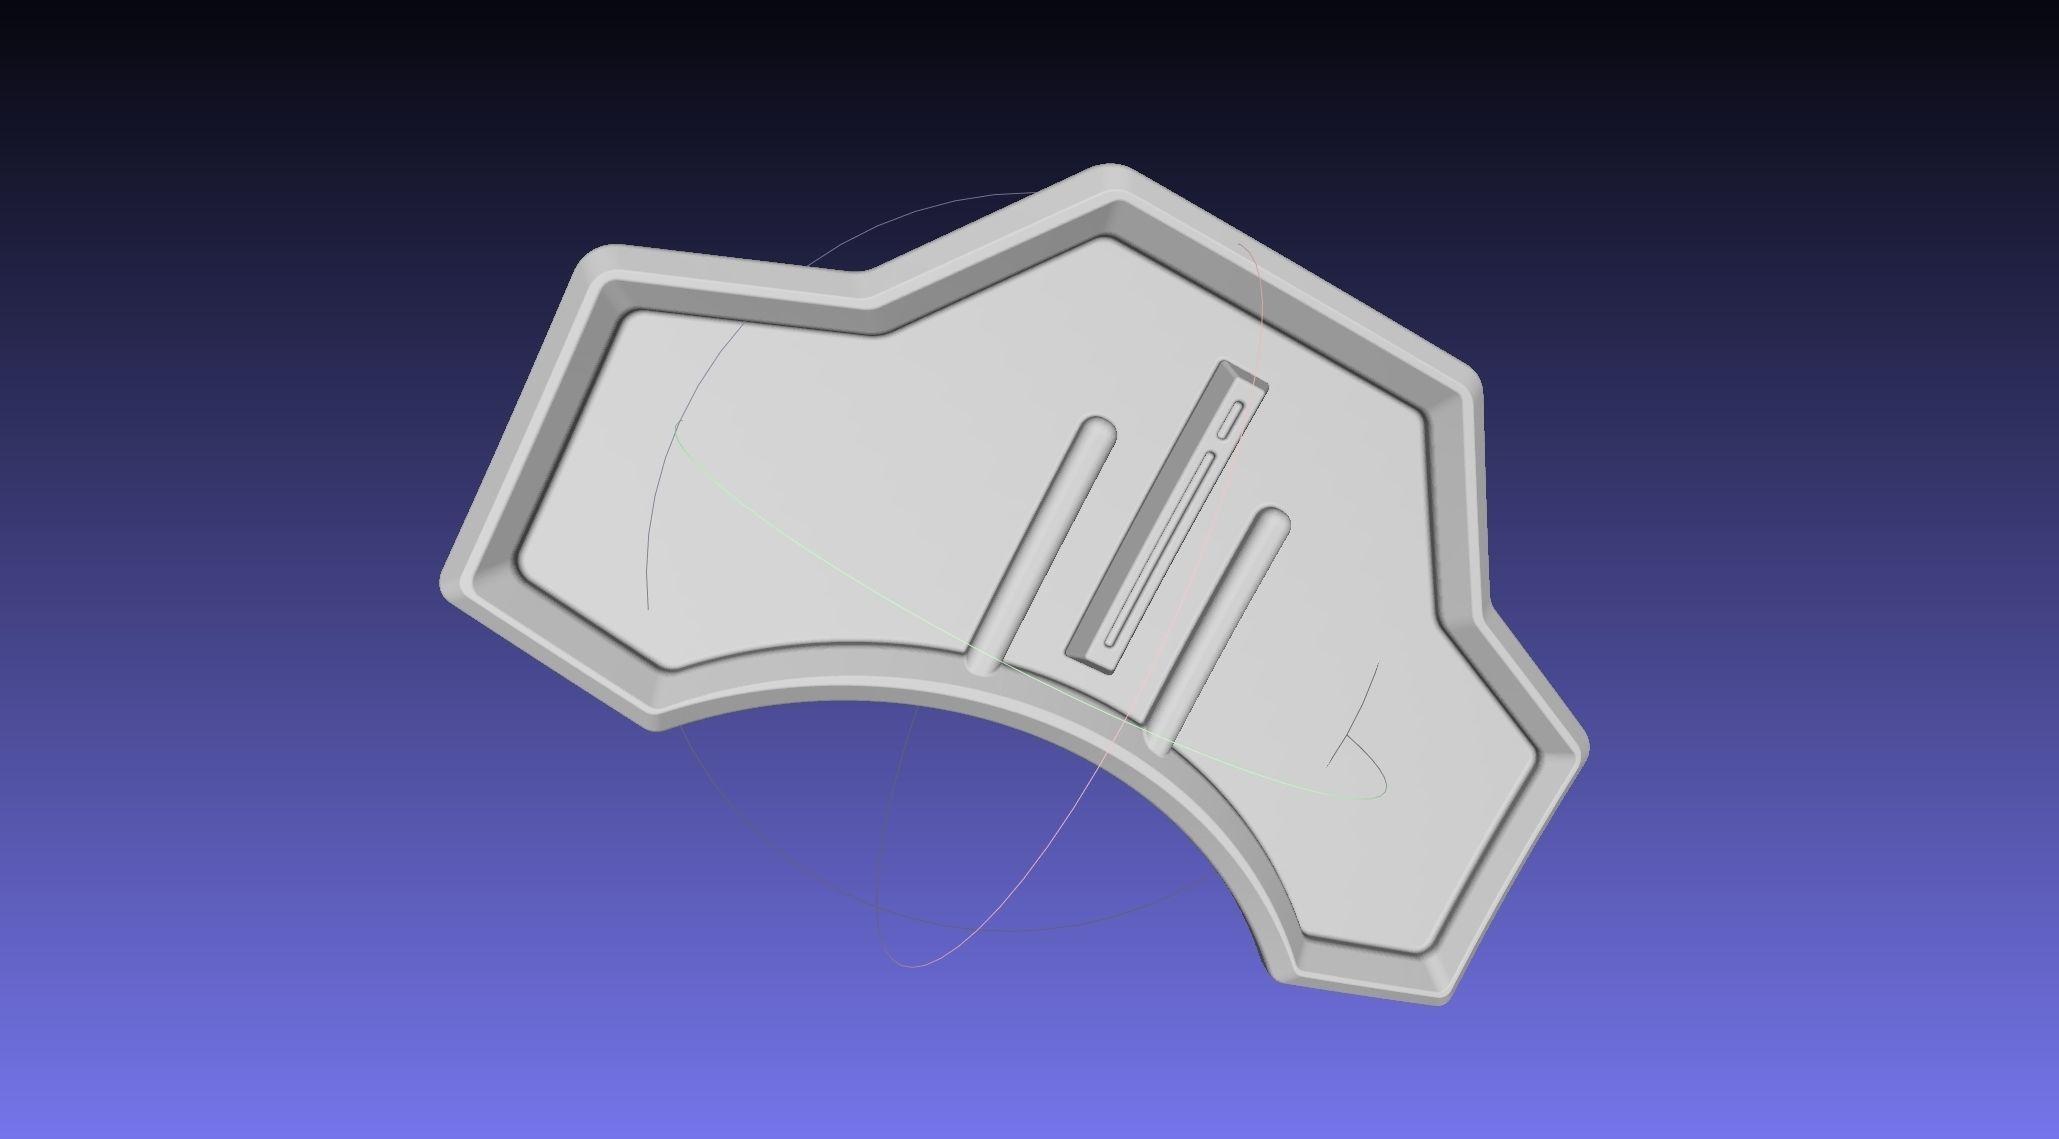 Star Wars Mandalorian Cara Dune Back Armor